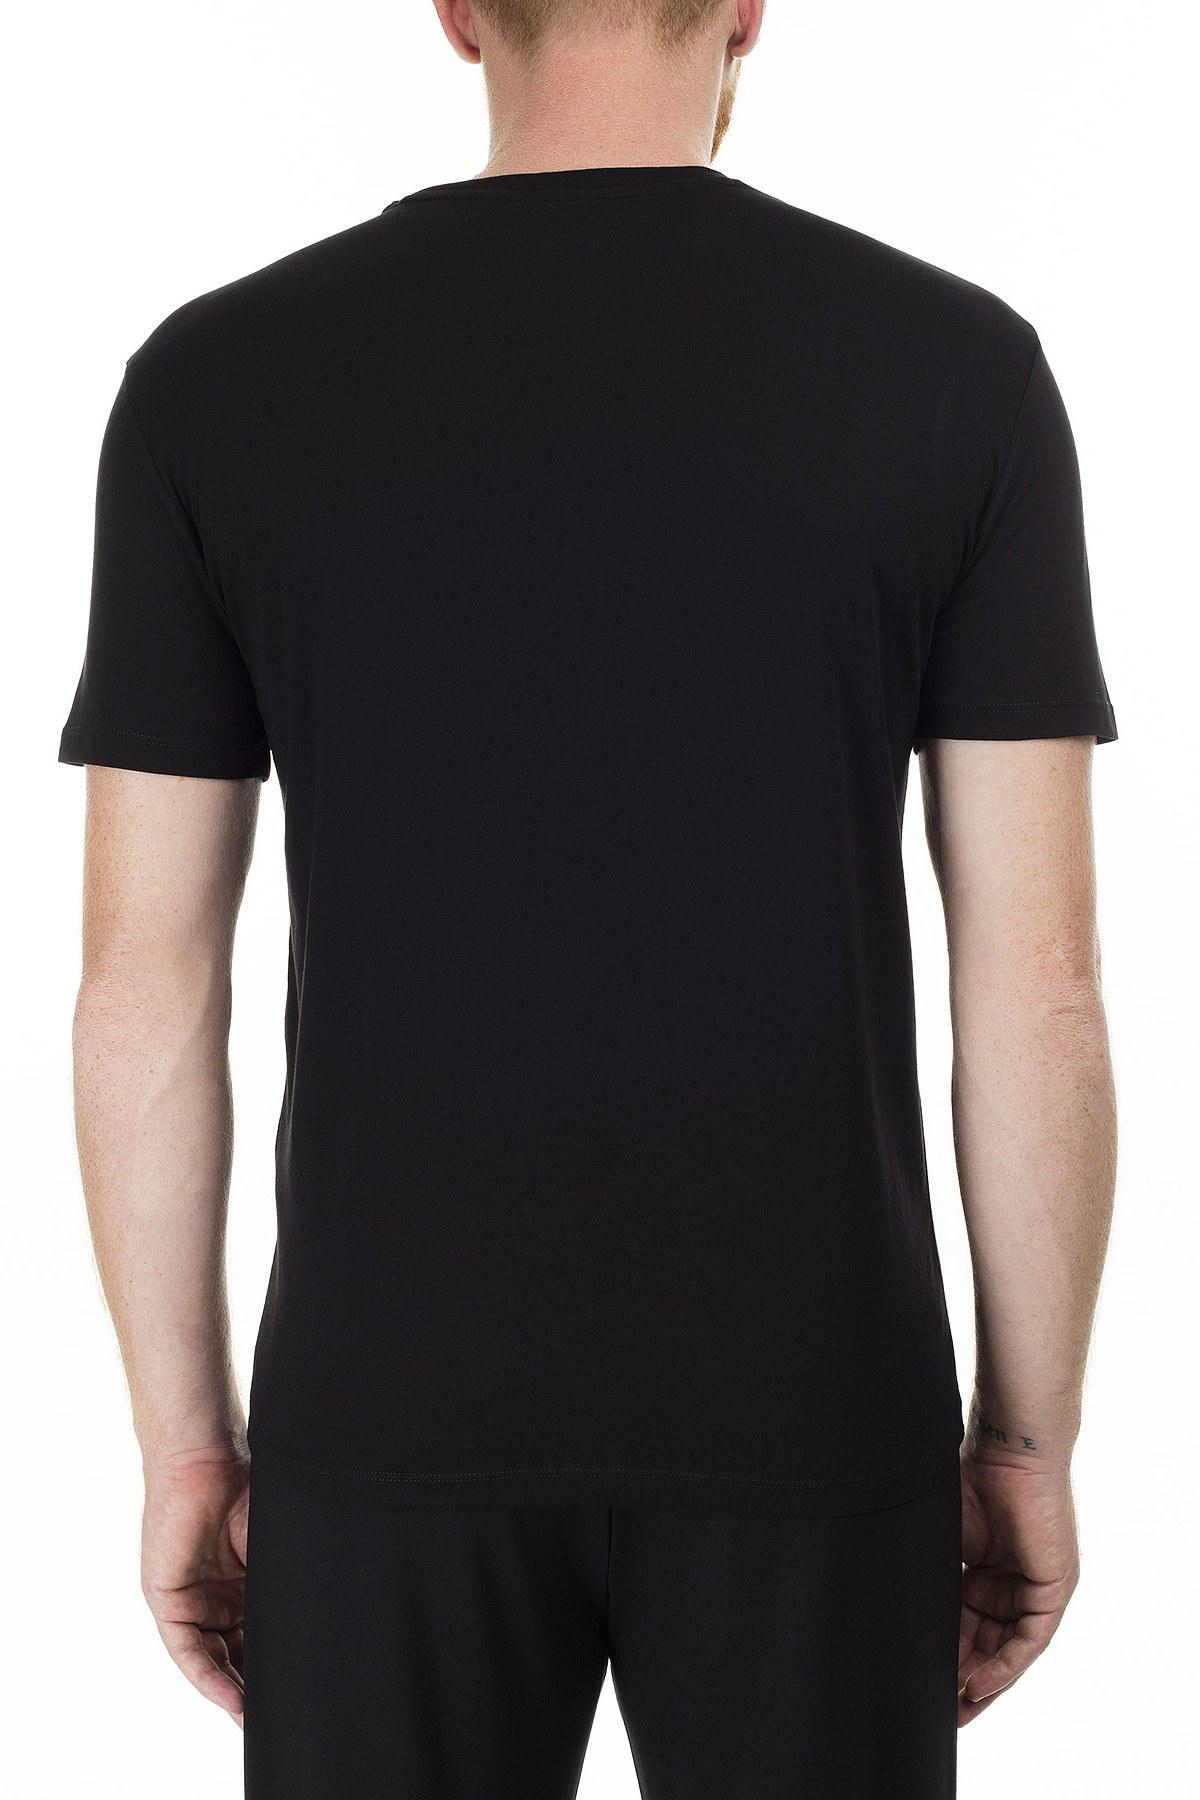 Armani Exchange Baskılı Bisiklet Yaka Erkek T Shirt 3HZTHN ZJH4Z 1200 SİYAH